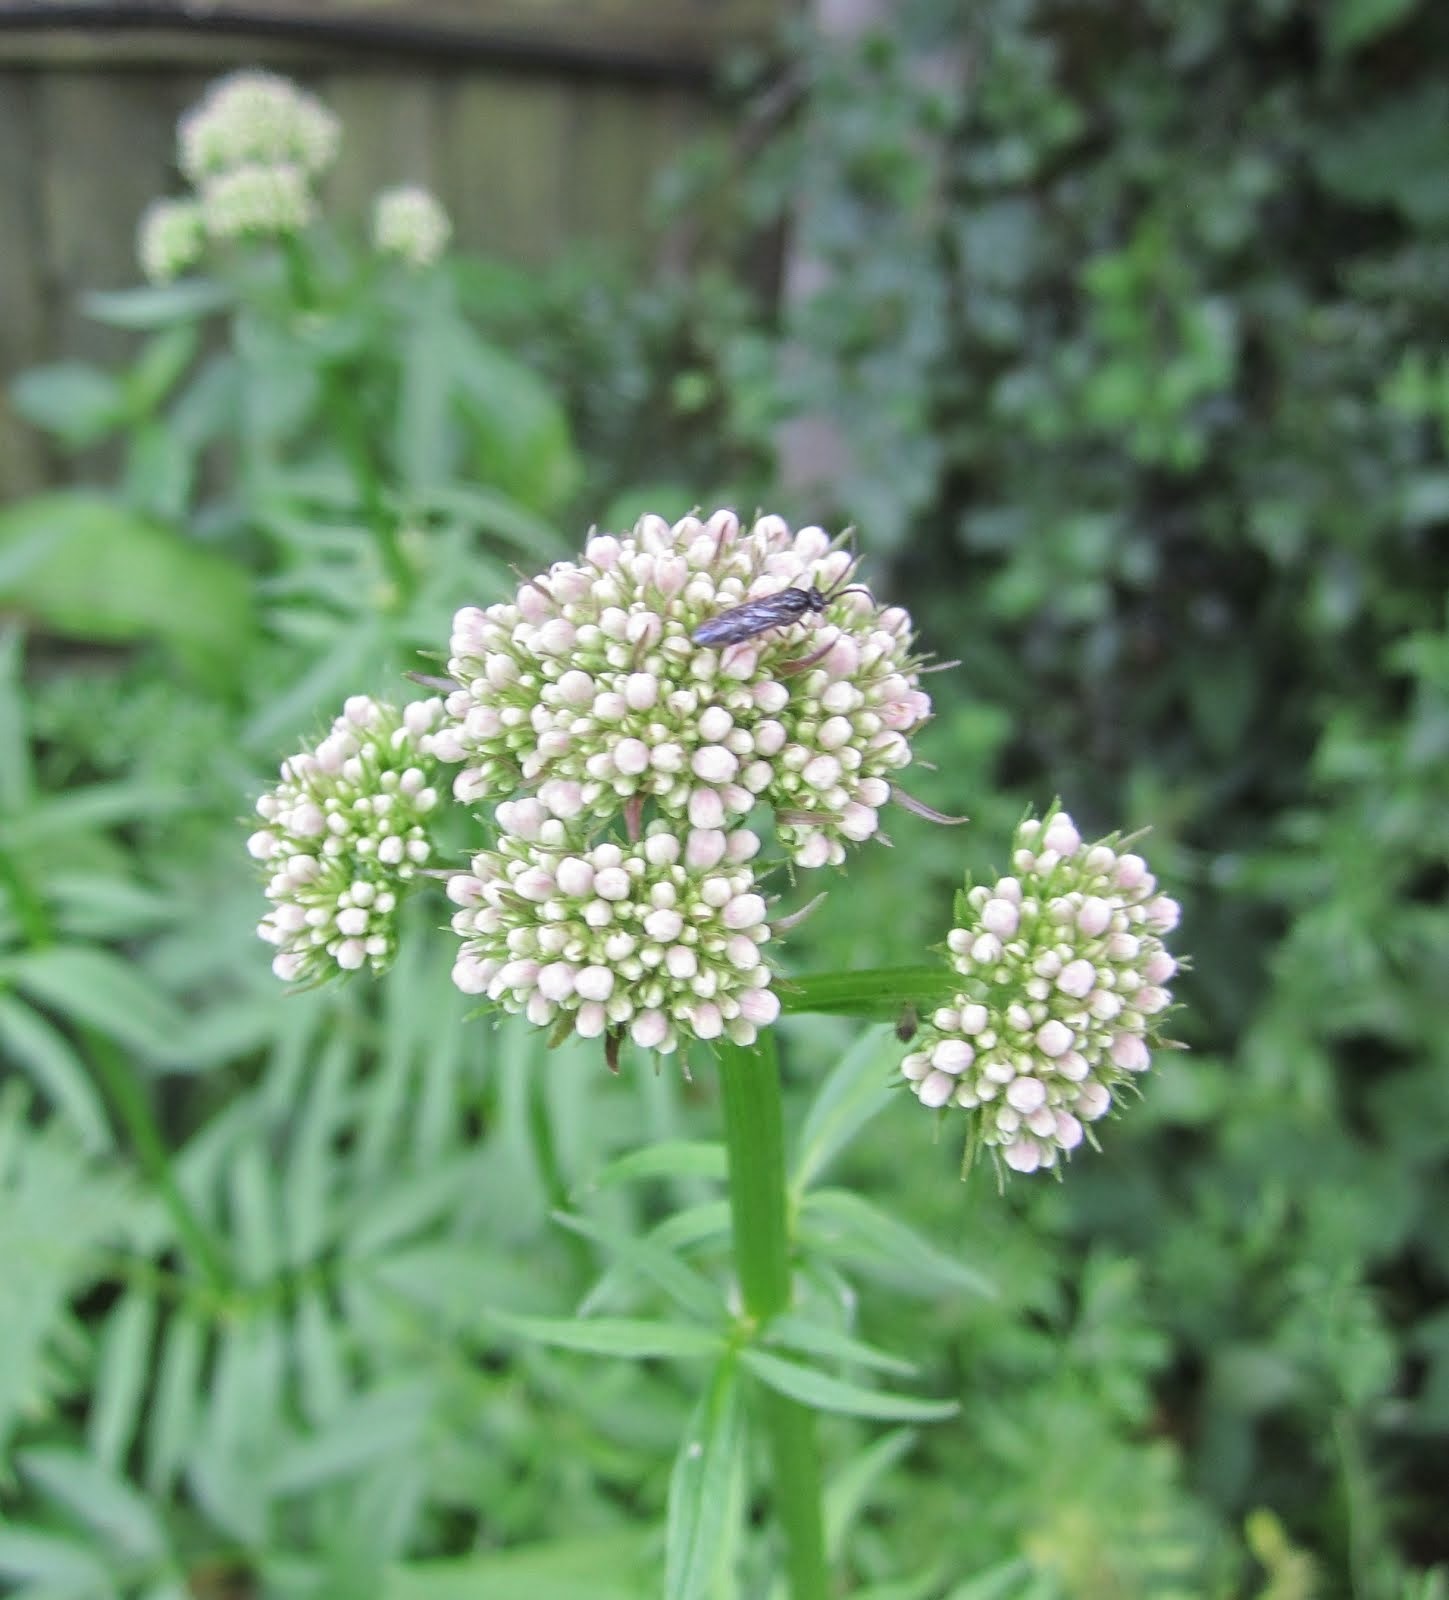 Valerian flower buds